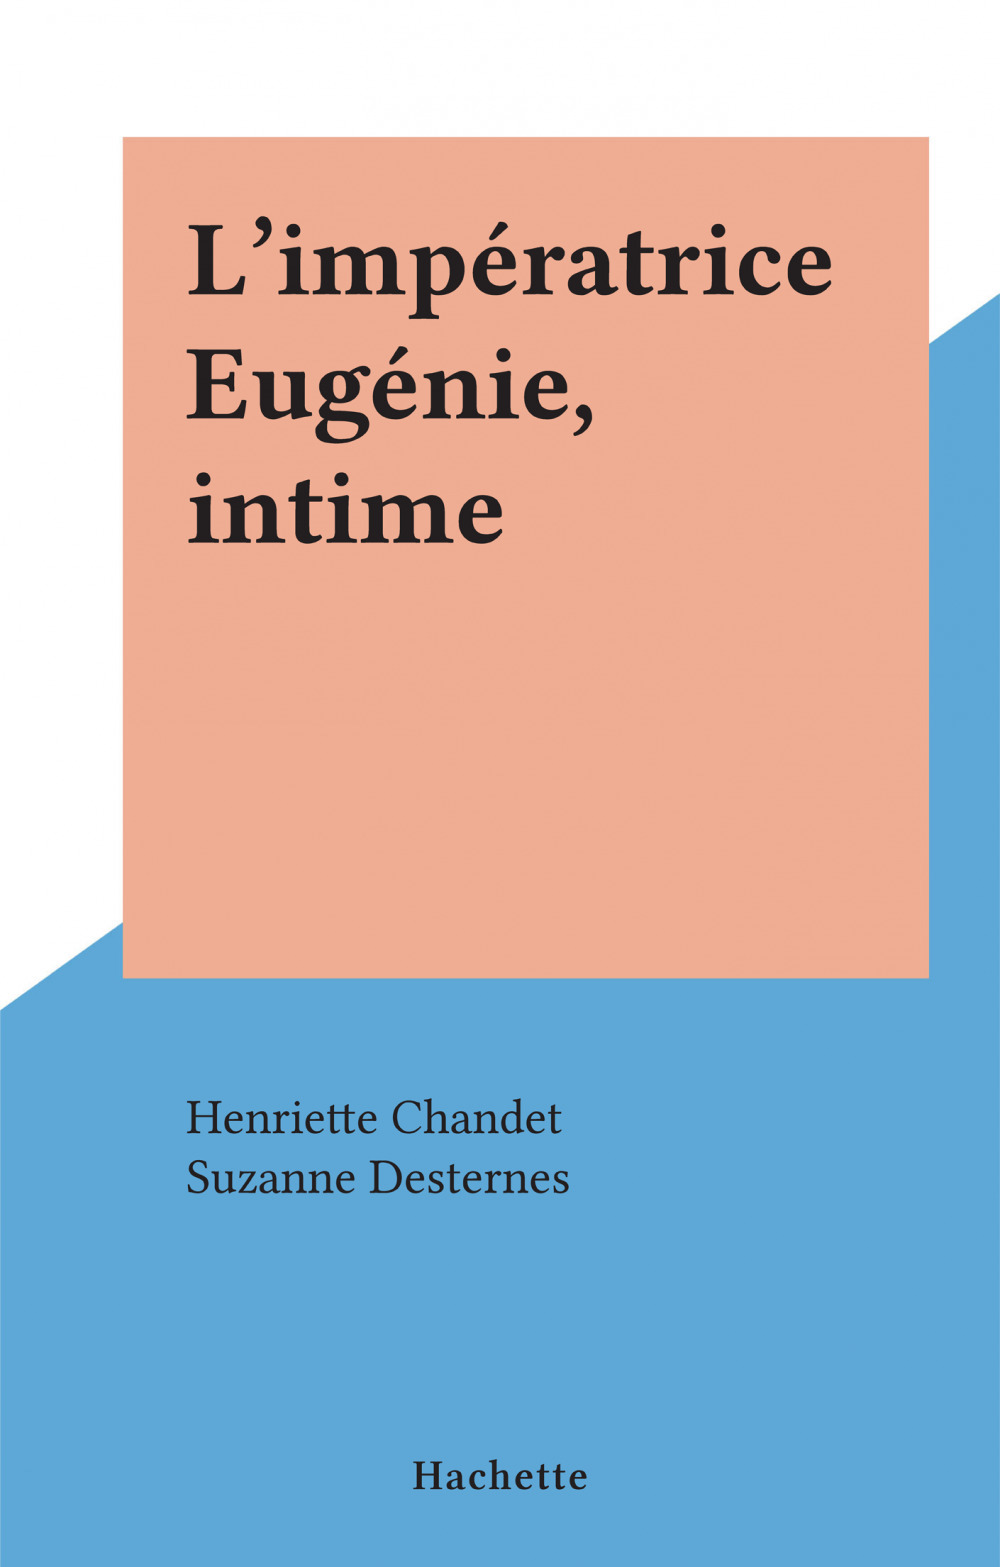 L'impératrice Eugénie, intime